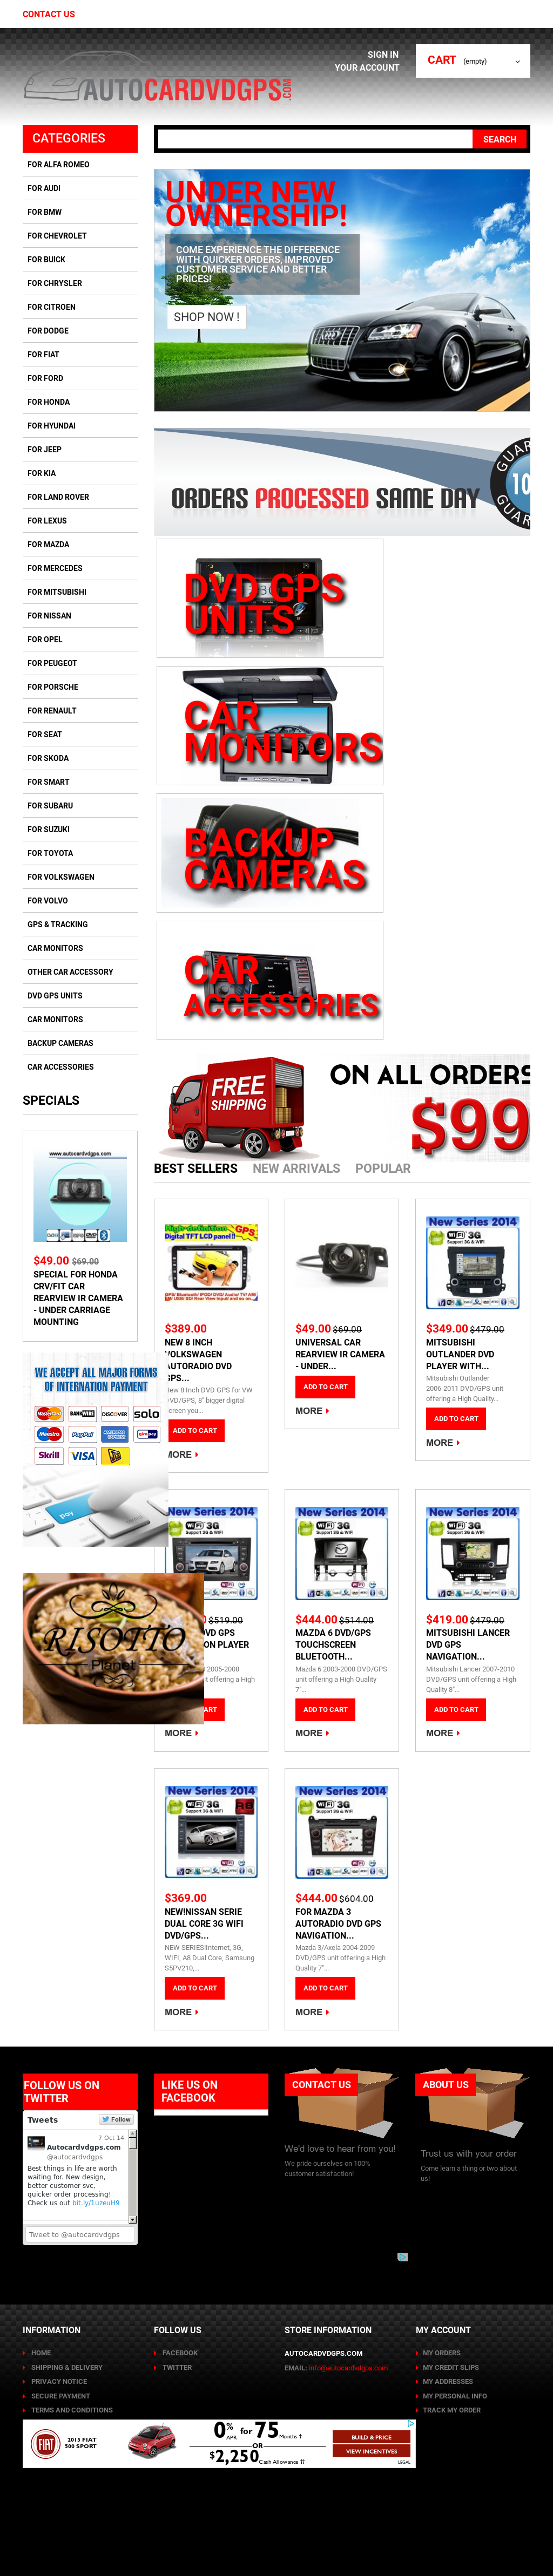 Autocardvdgps autocardvdgps competitors, revenue and employees - owler